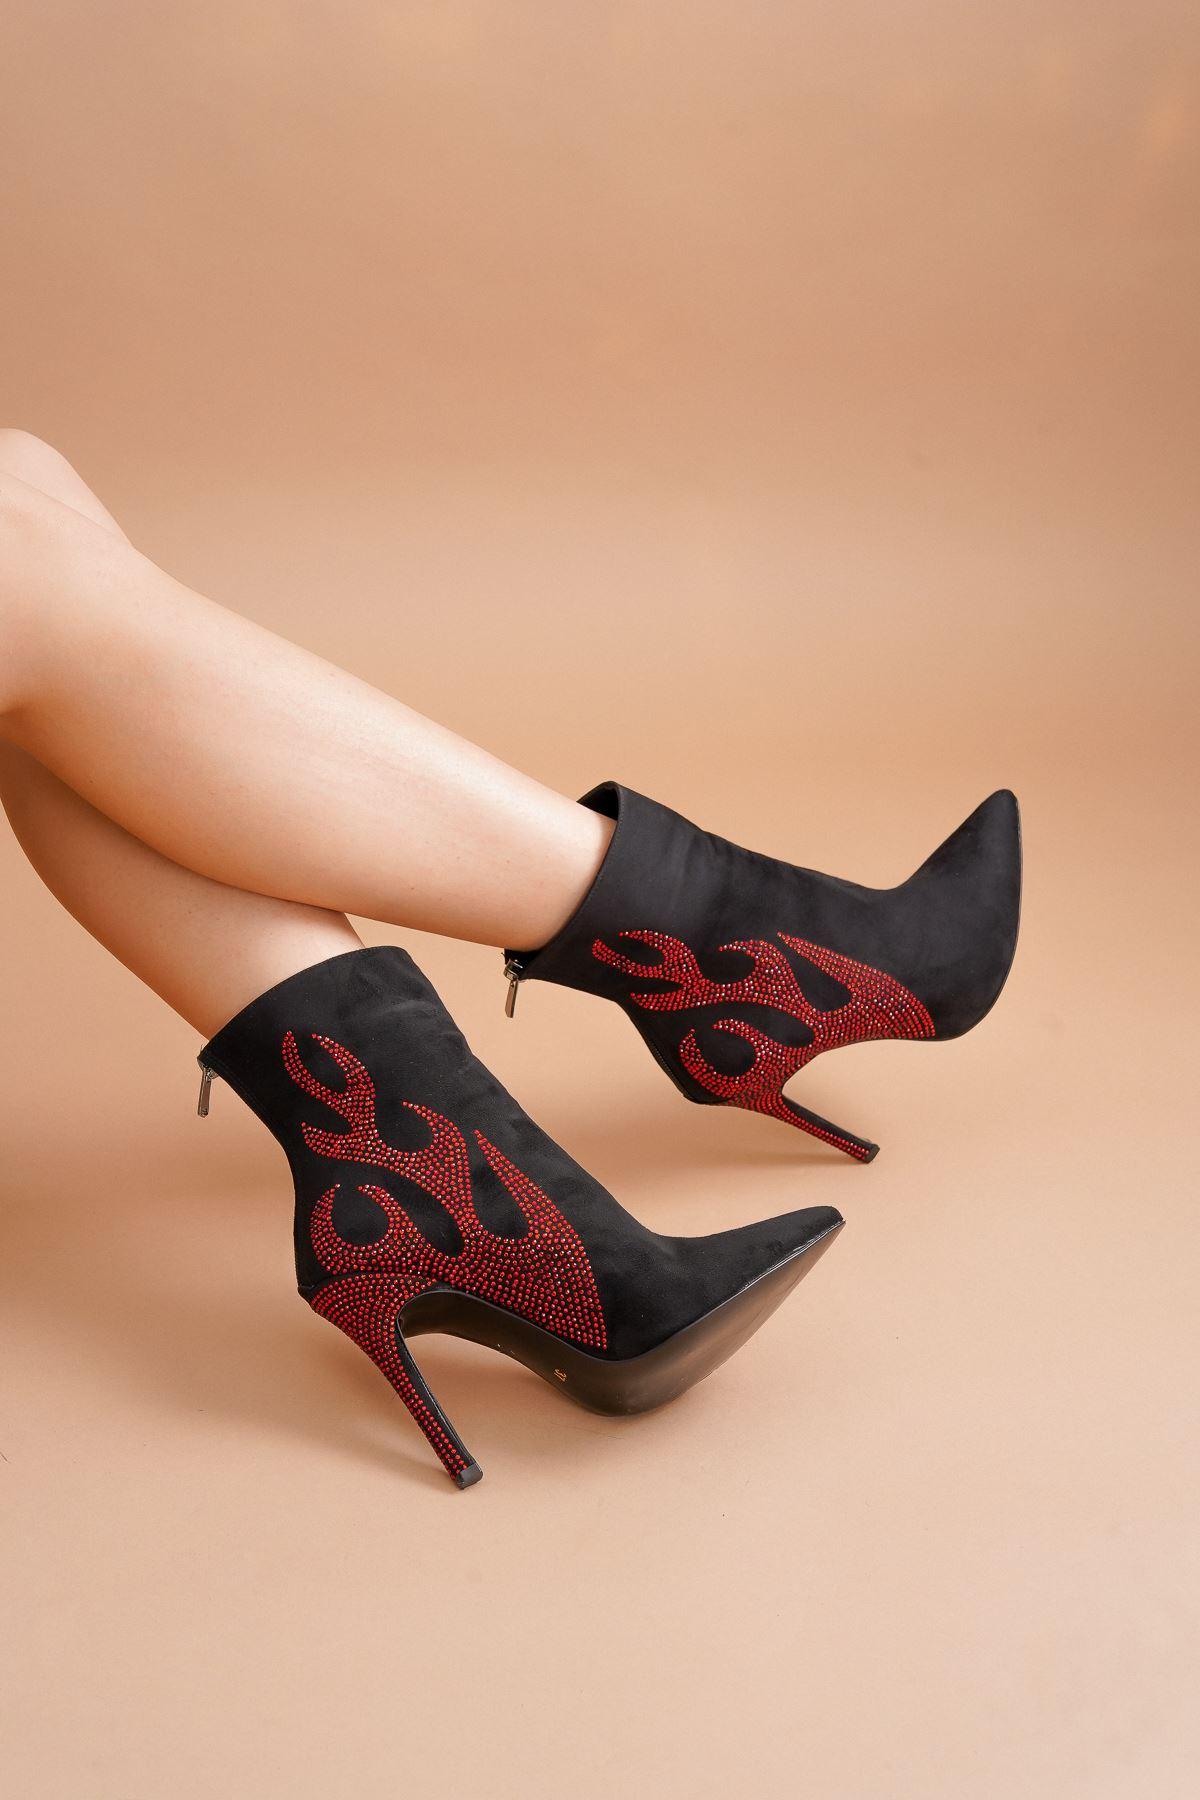 Tegan Siyah Süet Kırmızı Taş Alevli Topuklu Bot